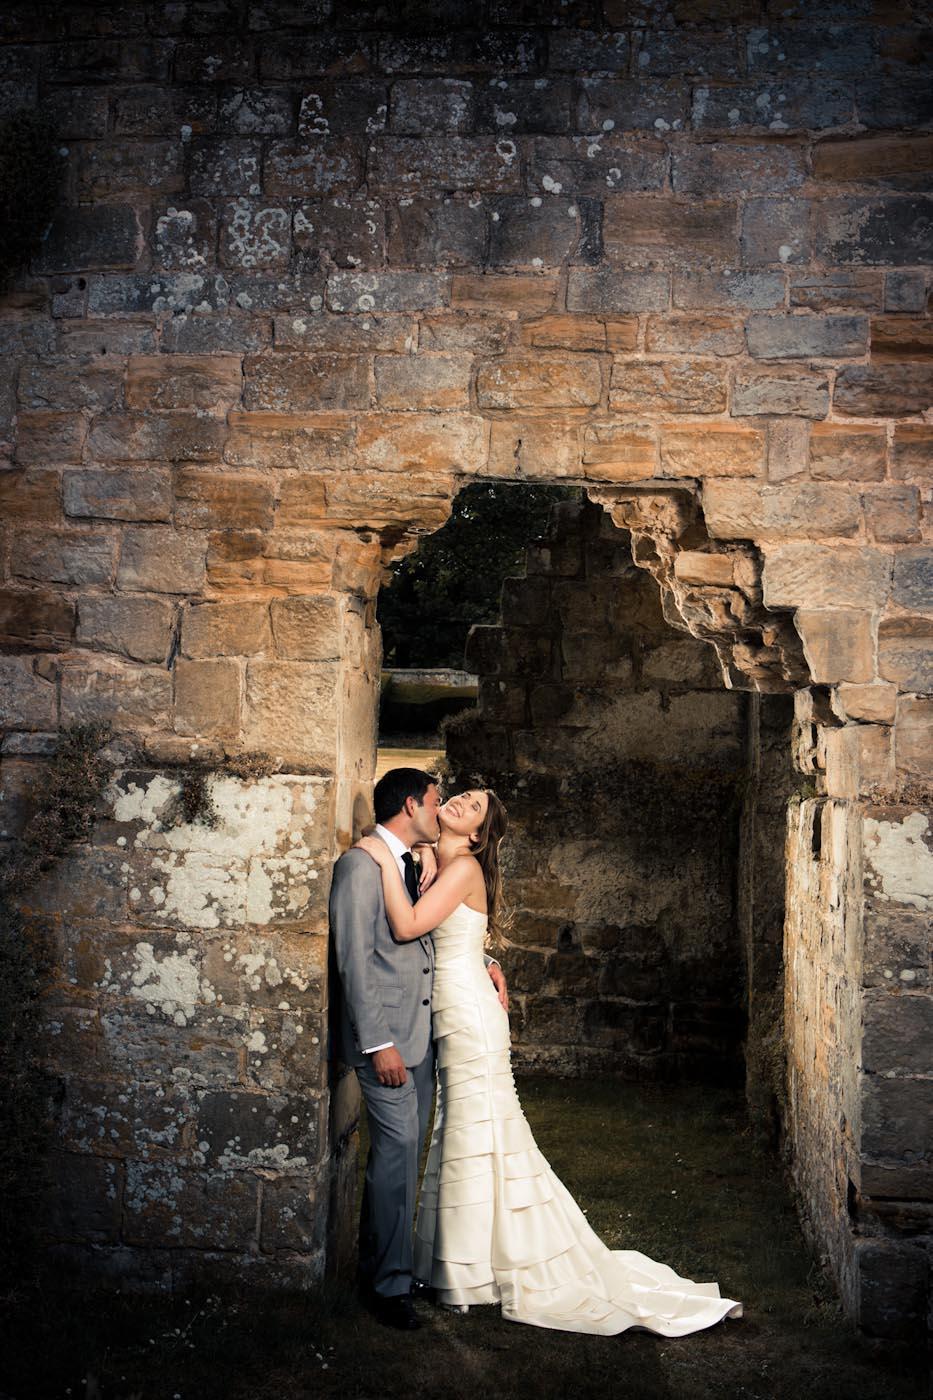 dan_burman_wedding_photography (6).jpg